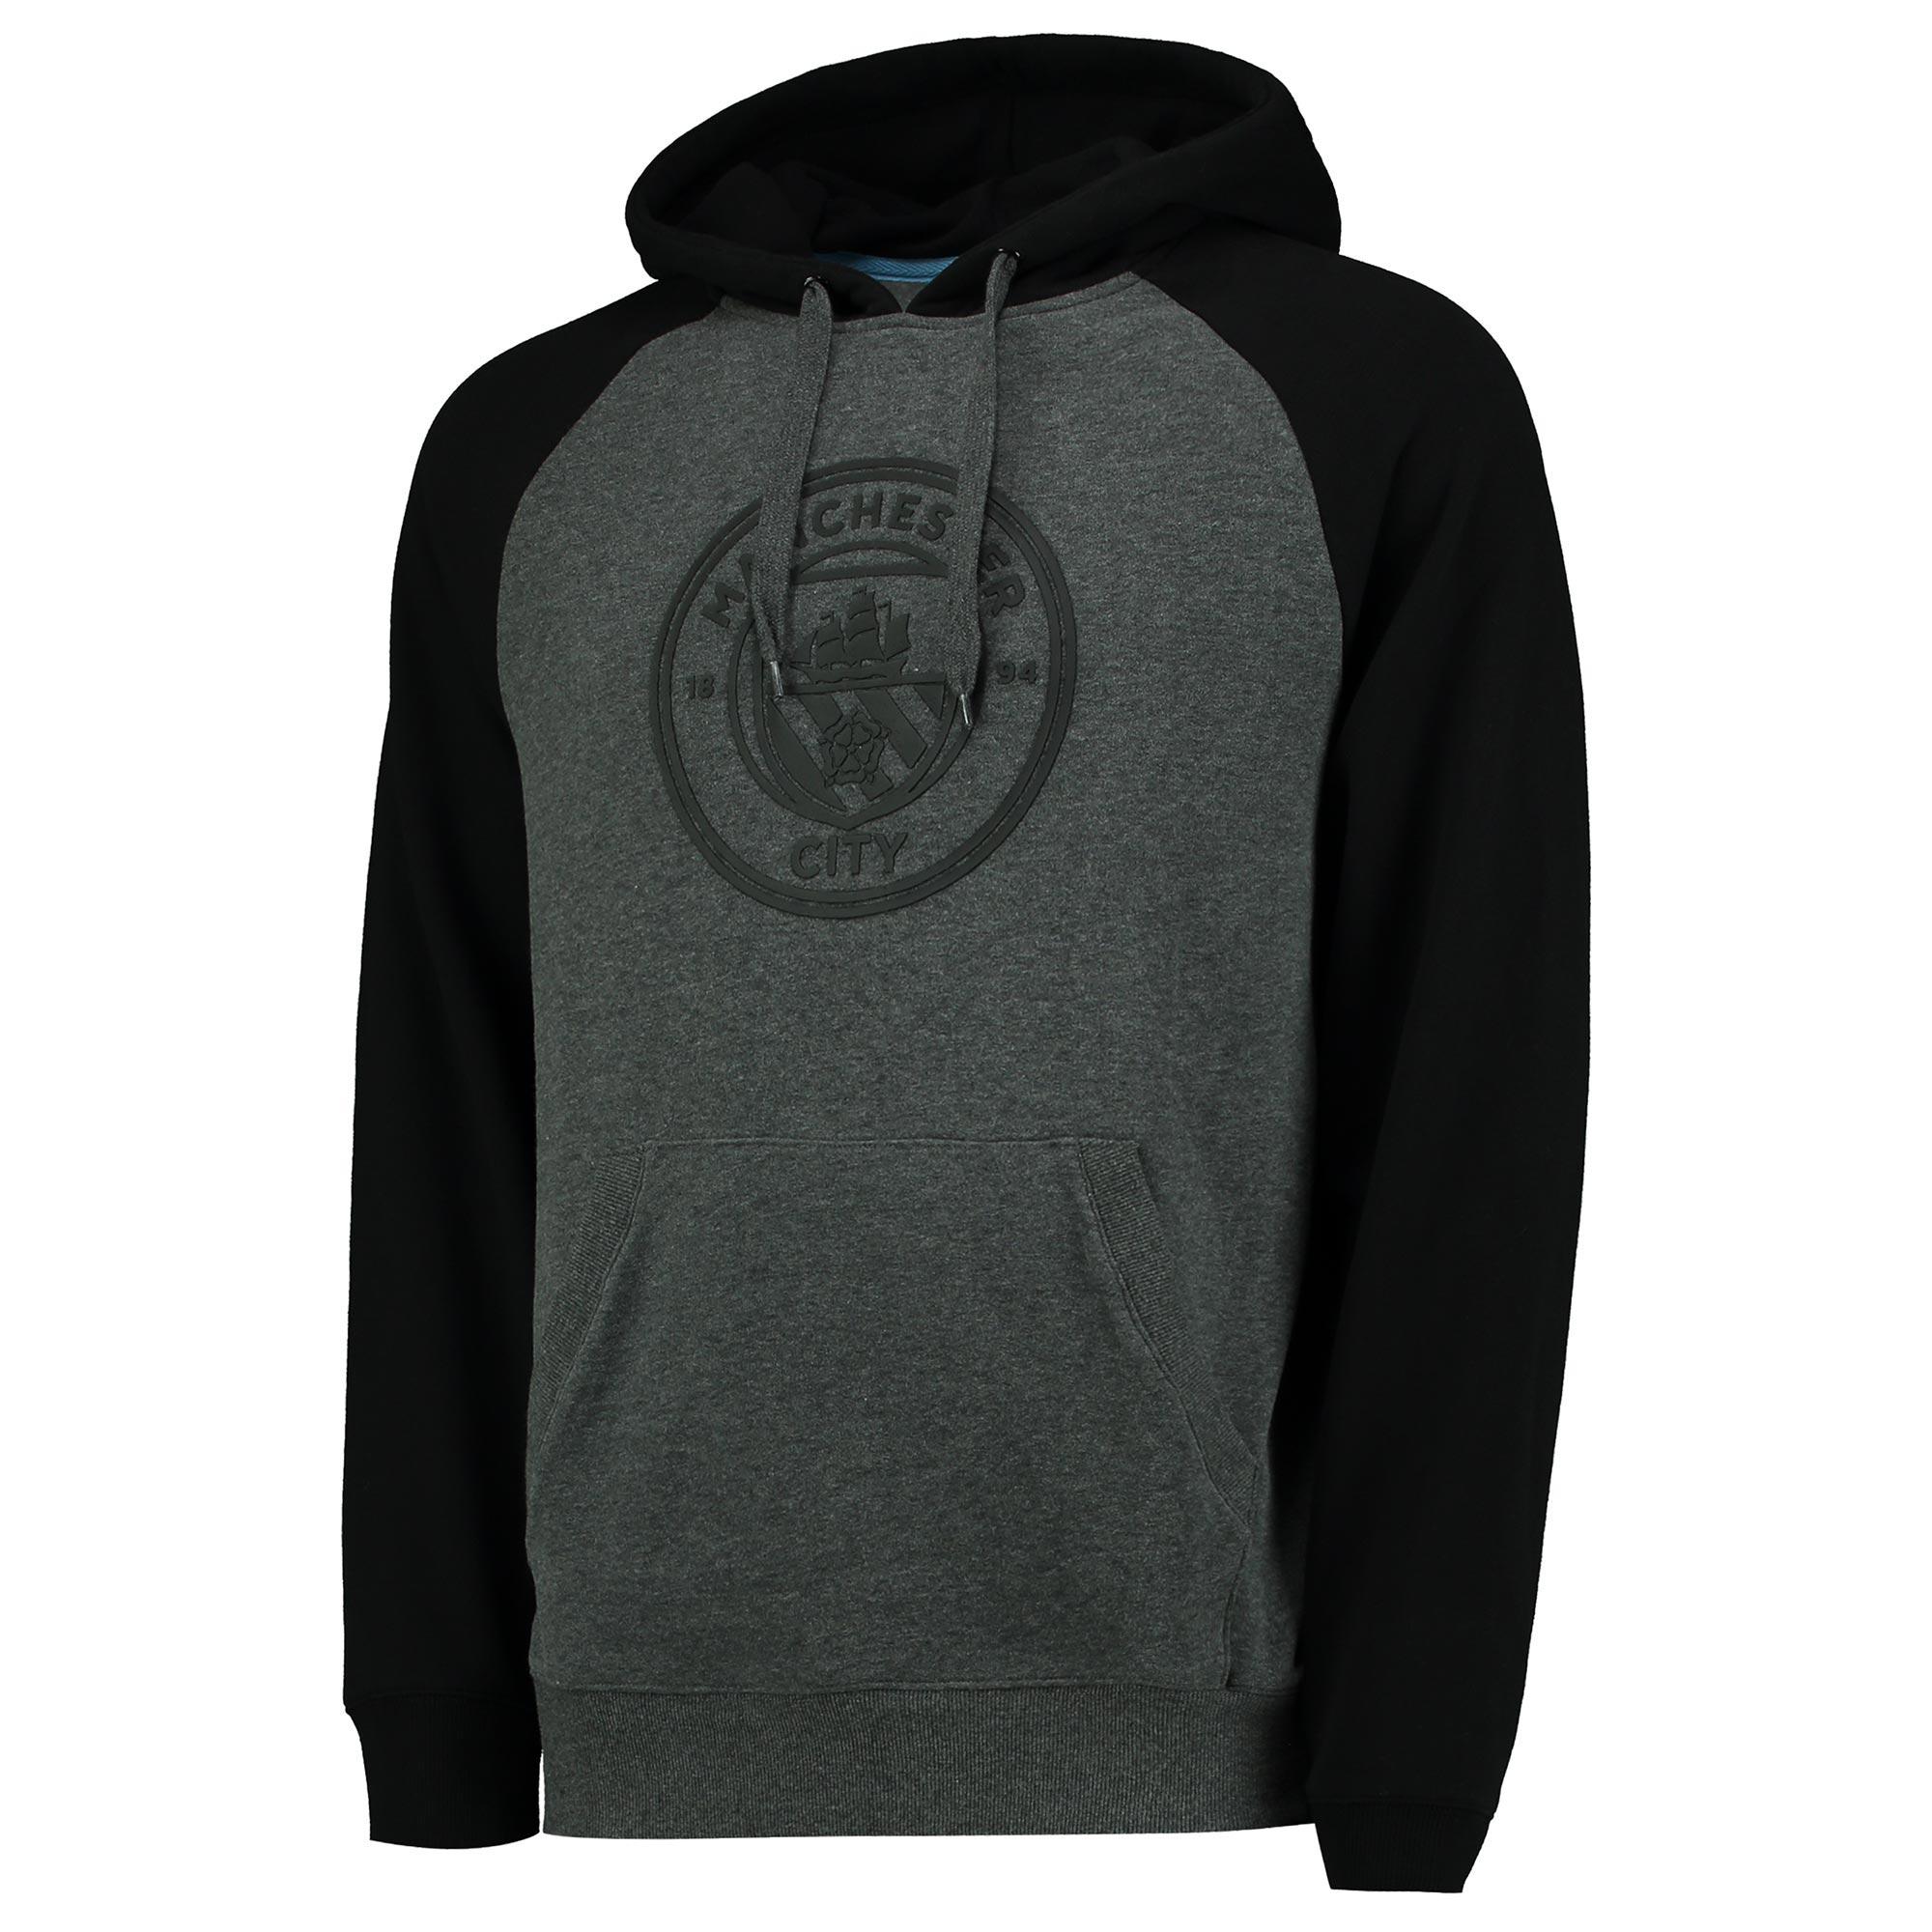 Manchester City Classic OTH Raglan Hoodie - Grey/Black